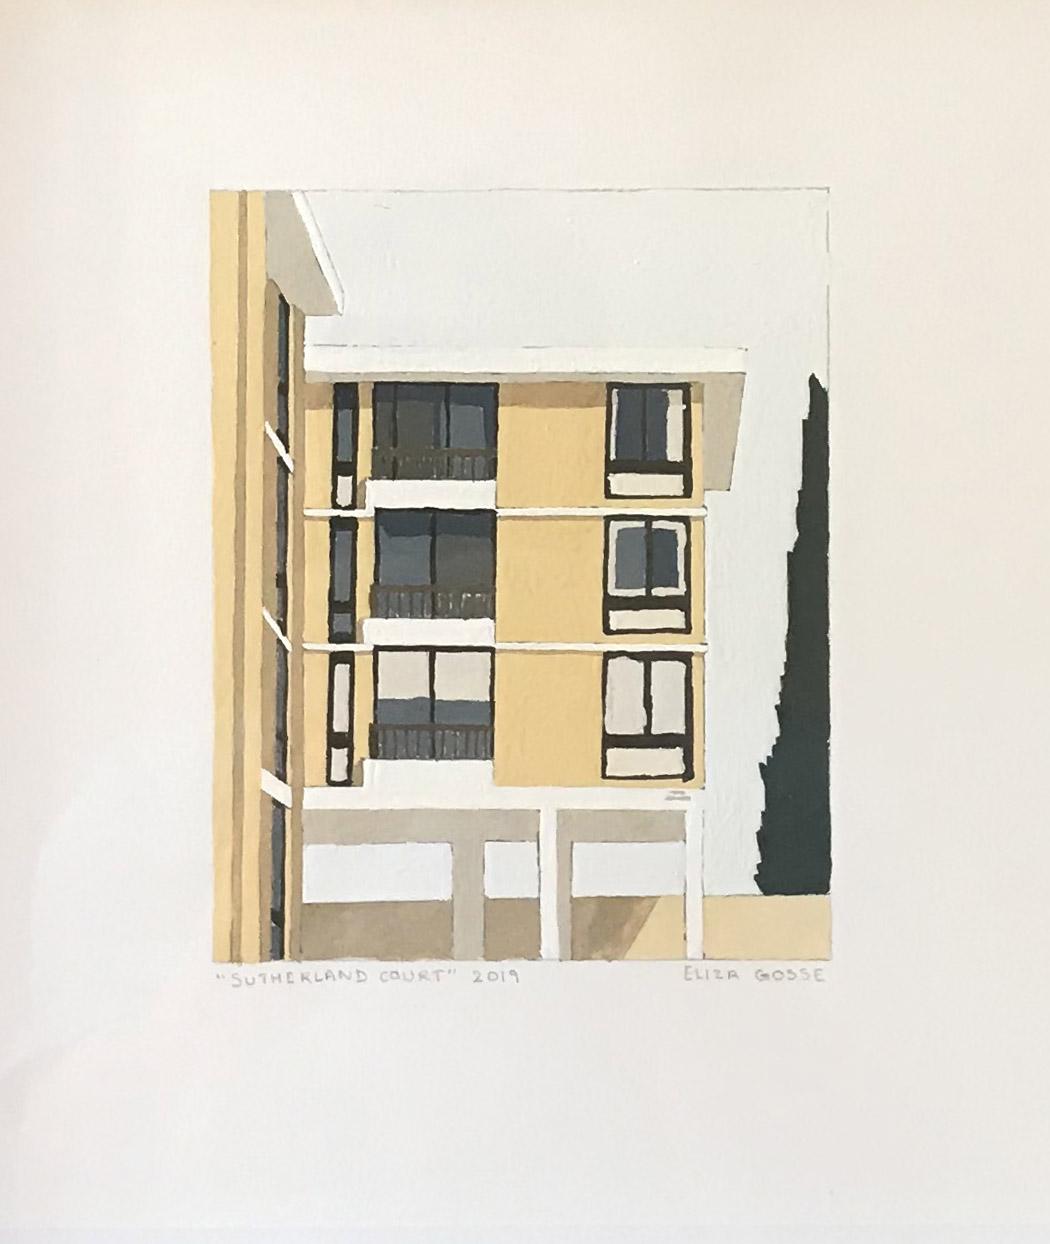 ELIZA GOSSE  Sutherland Court , 2019 gouache on paper 15 x 12 cm